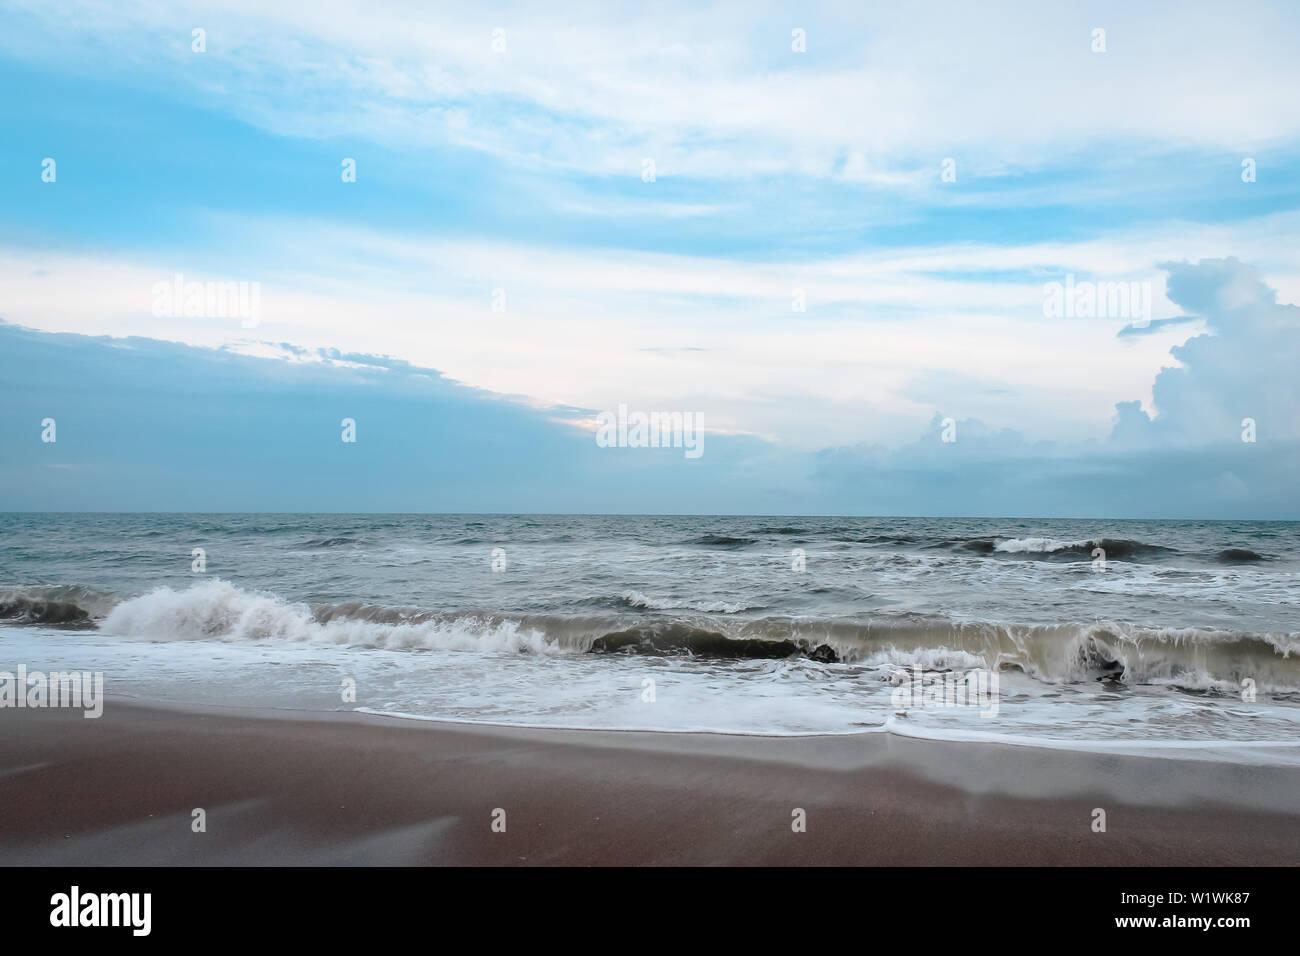 Waves crashing in on a North Carolina Beach Stock Photo: 259334103